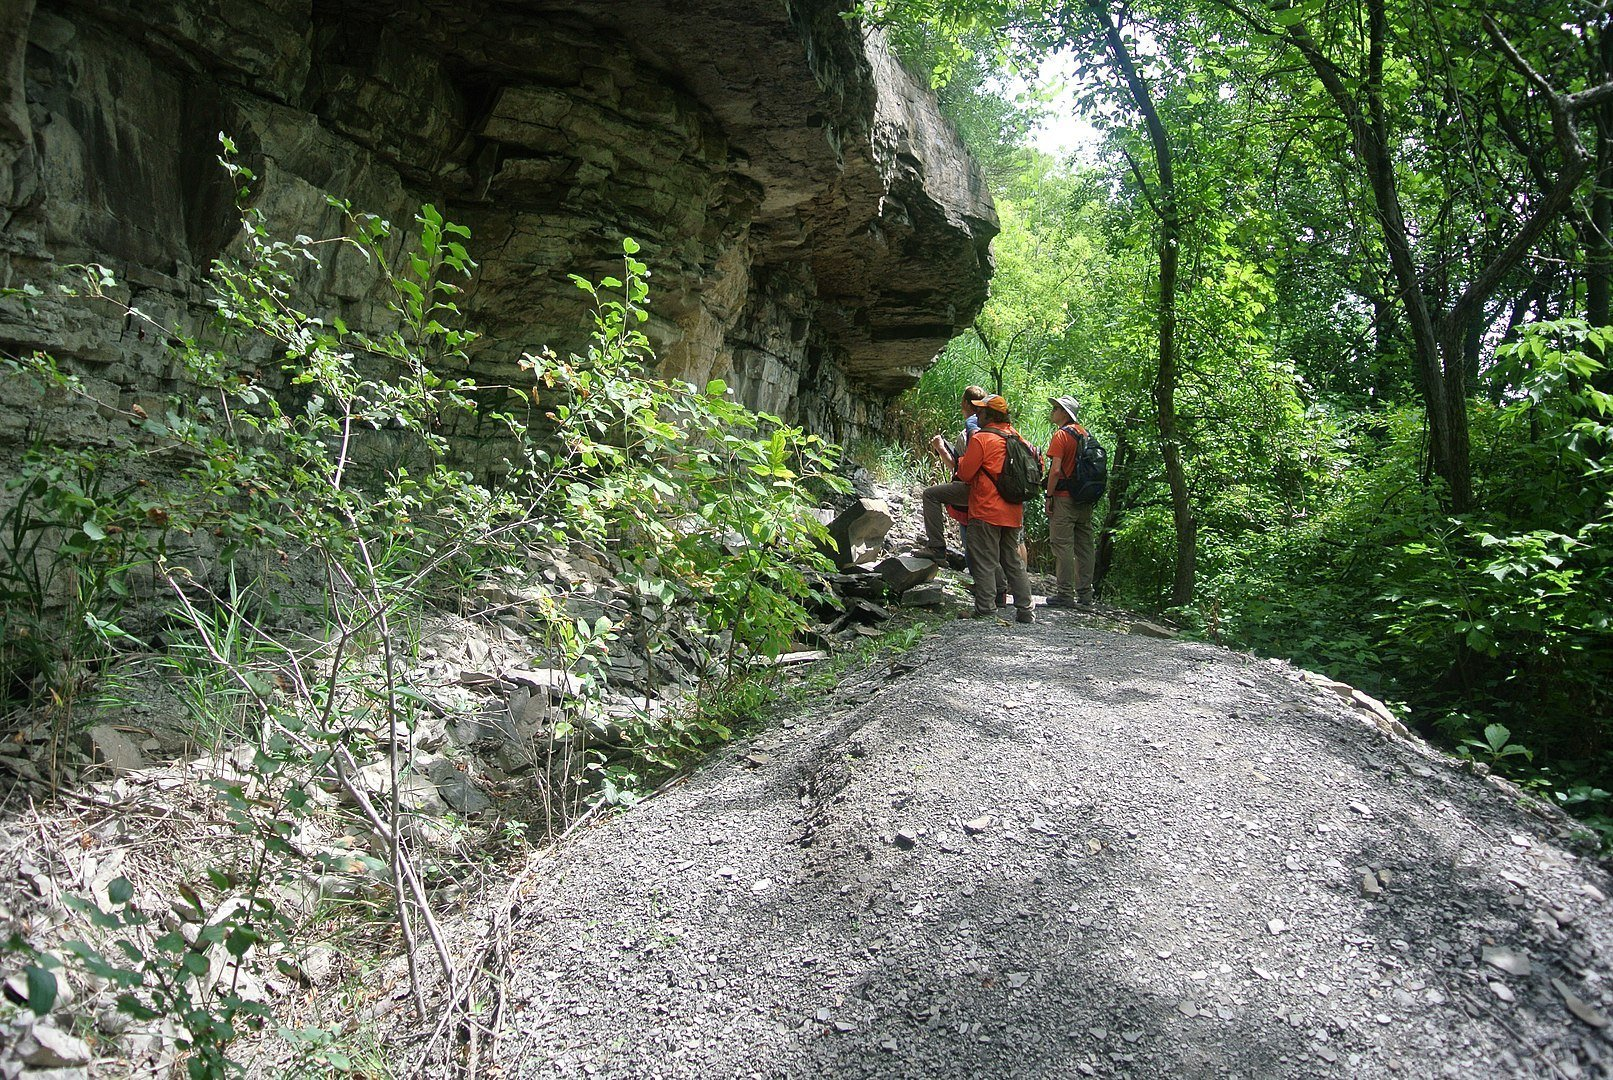 Niagara Gorge Trail in New York